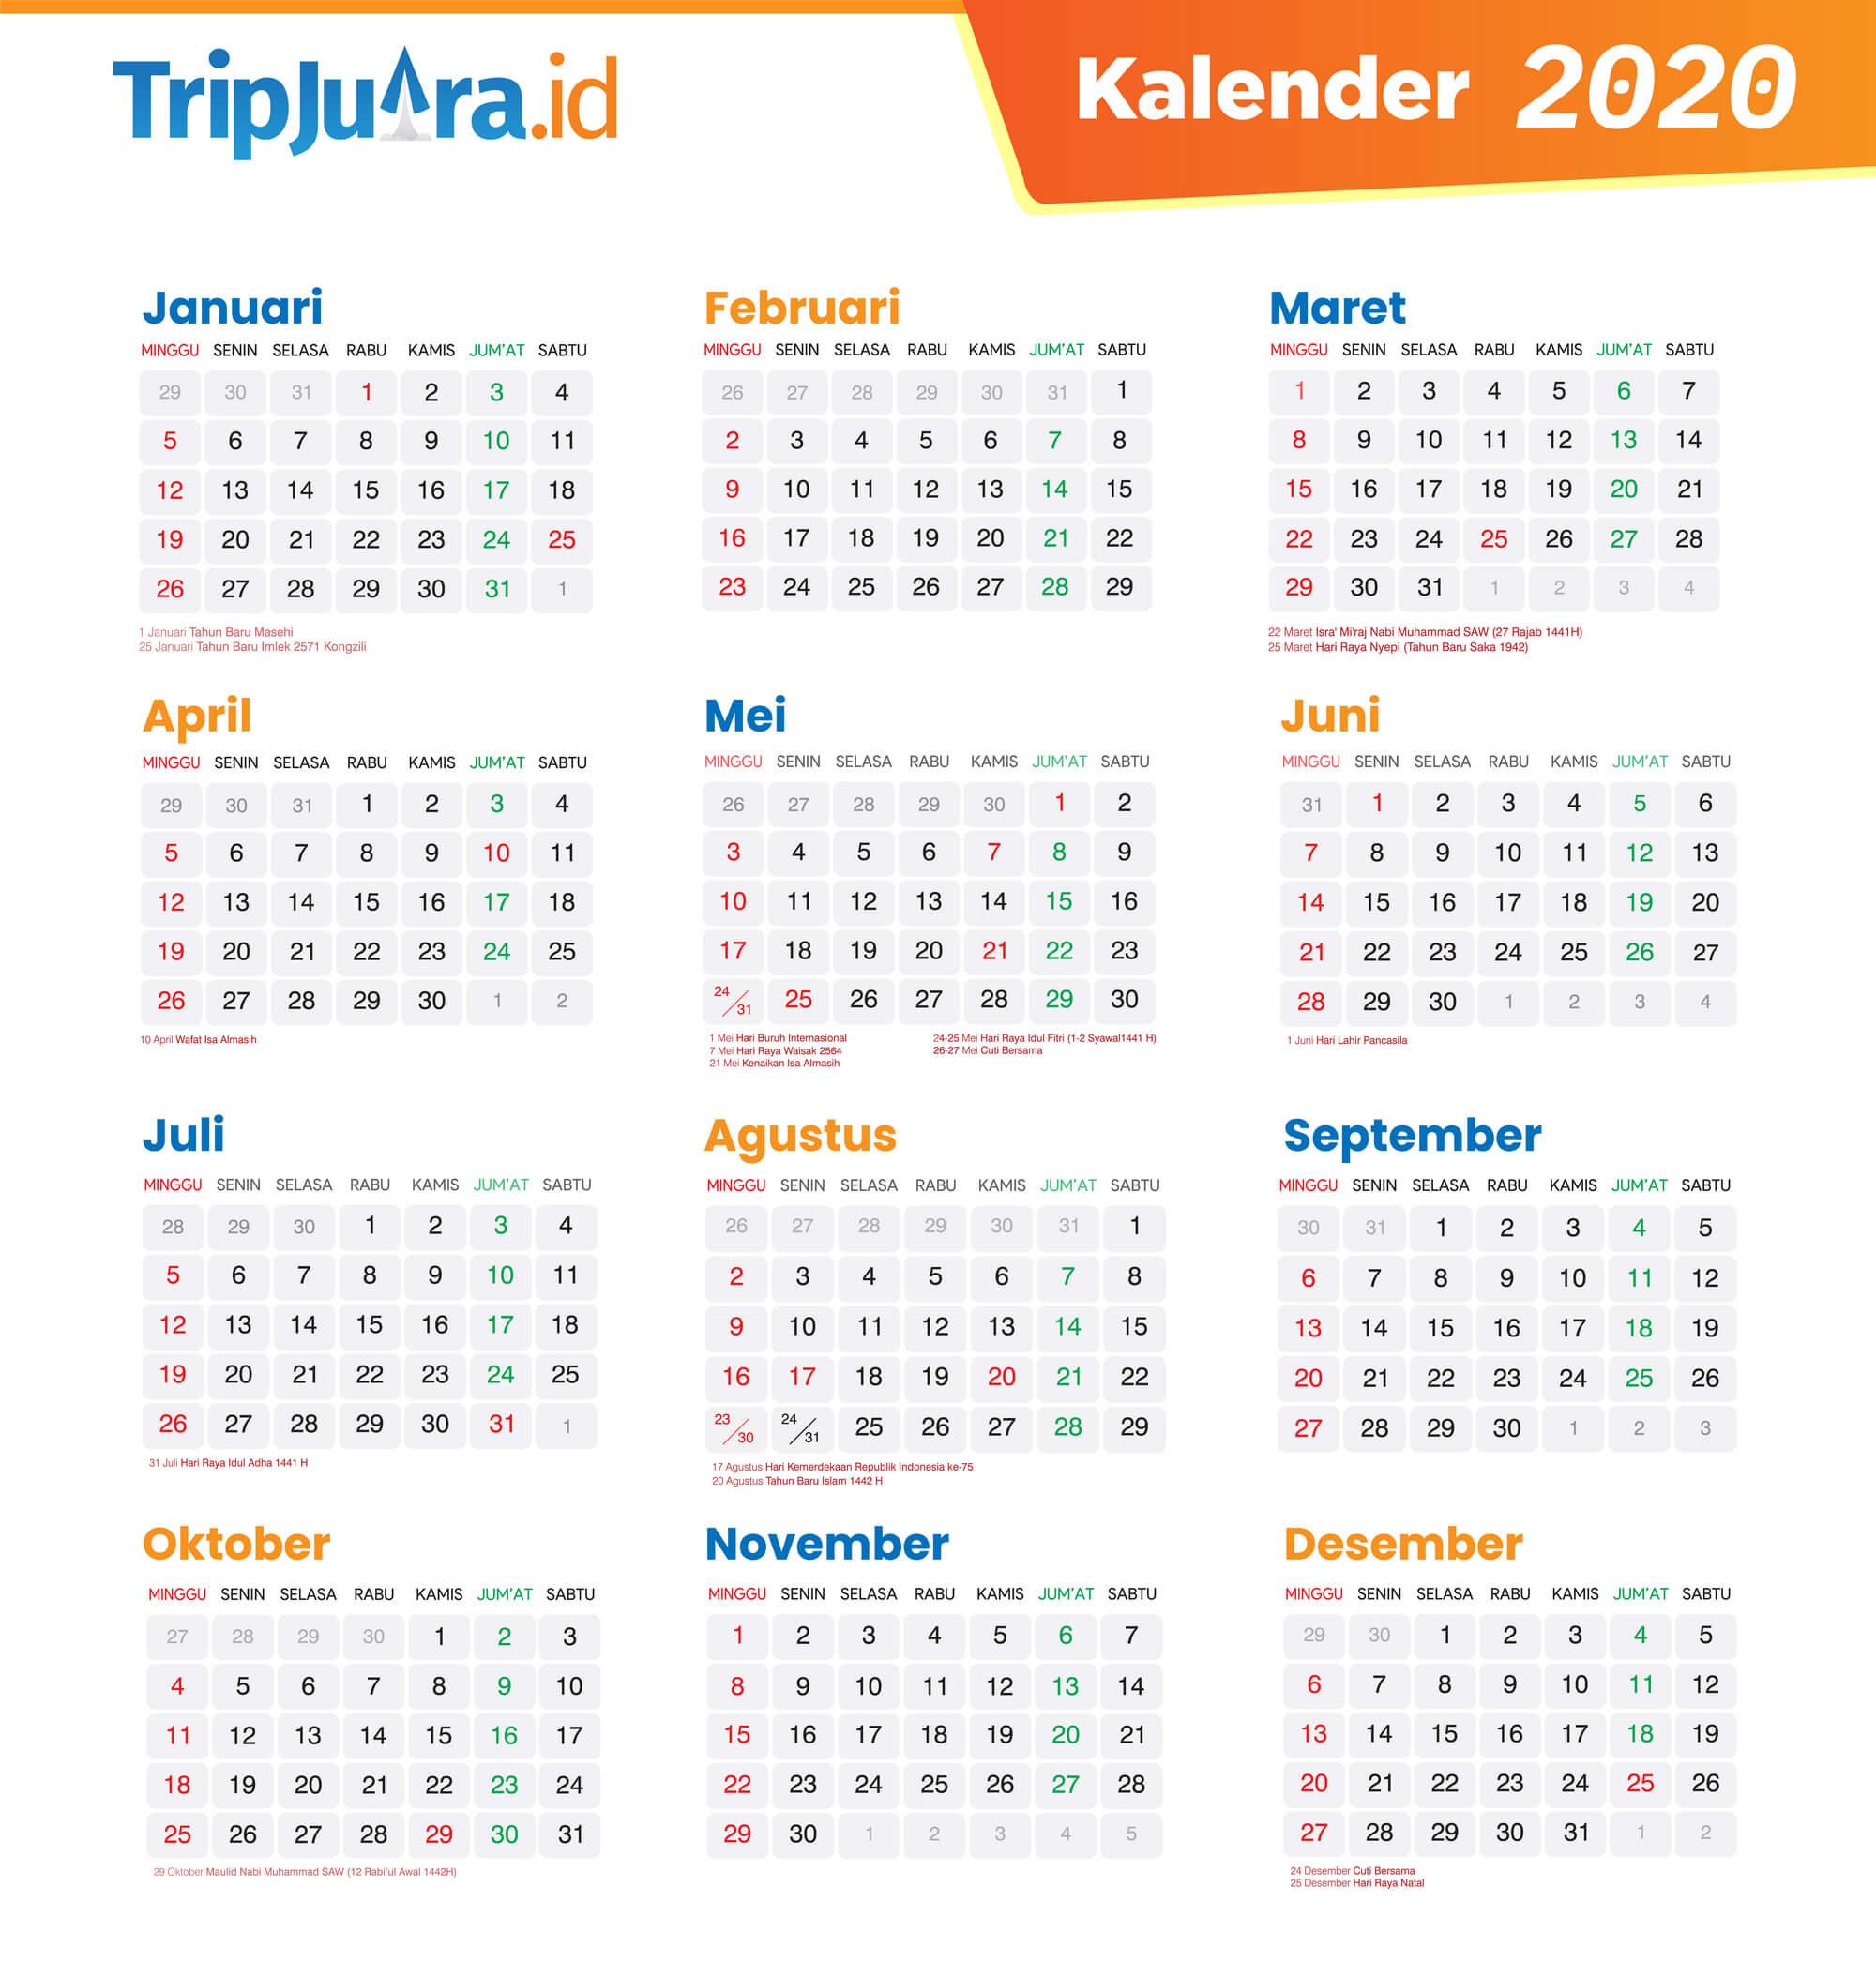 Kalender 2020 Indonesia